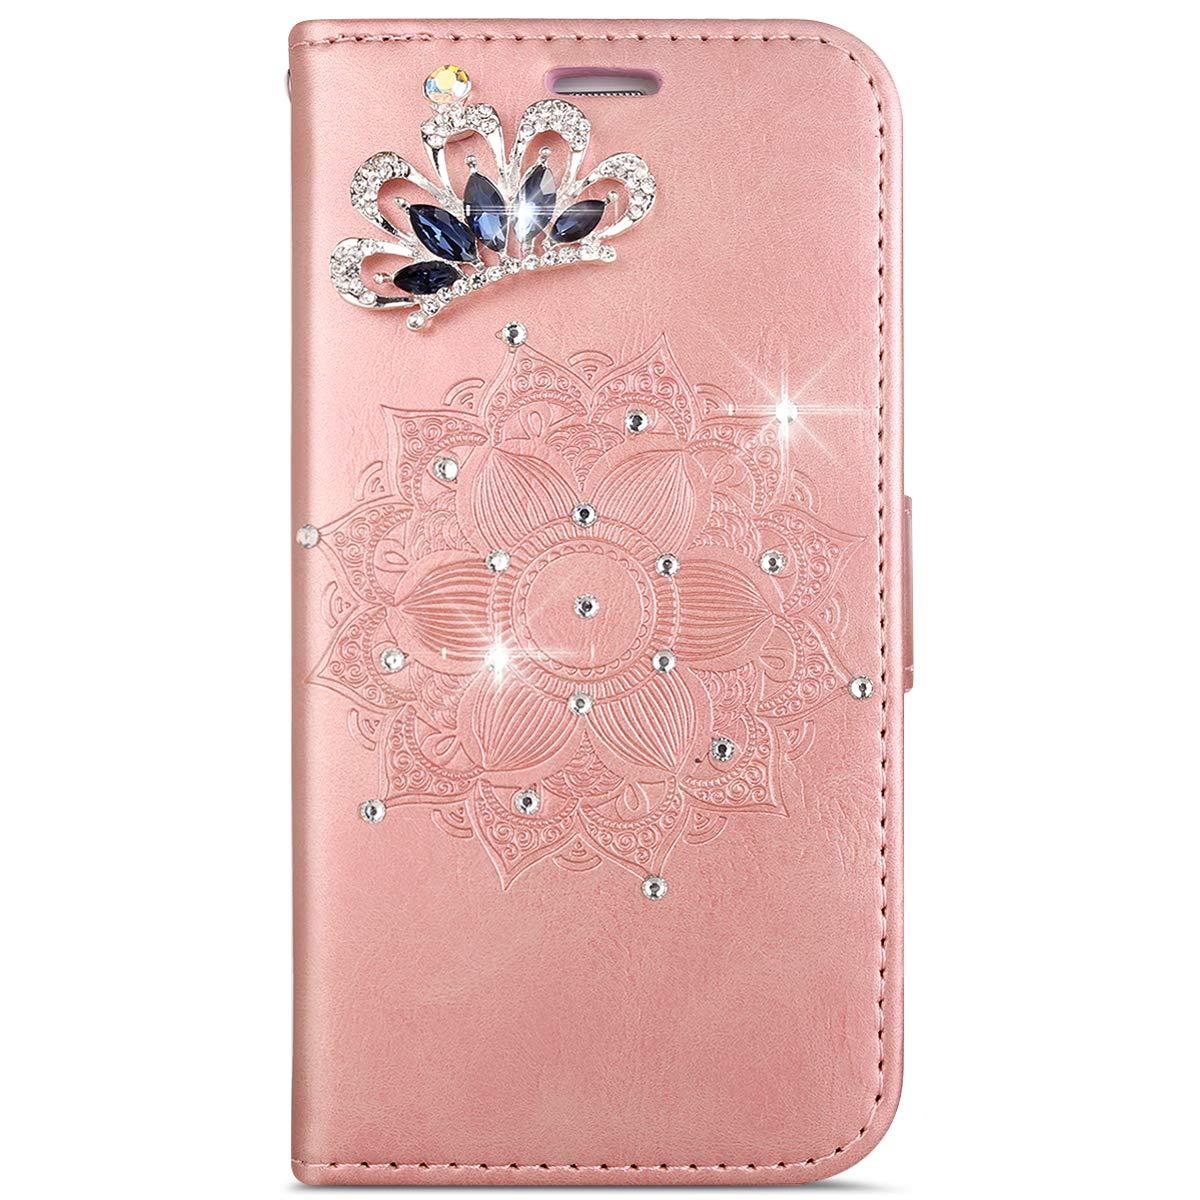 MoreChioce Galaxy S7 Edge Hülle,Galaxy S7 Edge Hülle Leder Glitzer, 3D Diamant Strass Kristall Glänzend Muster Klapphülle Flip Wallet Magnetverschluß für Samsung Galaxy S7 Edge